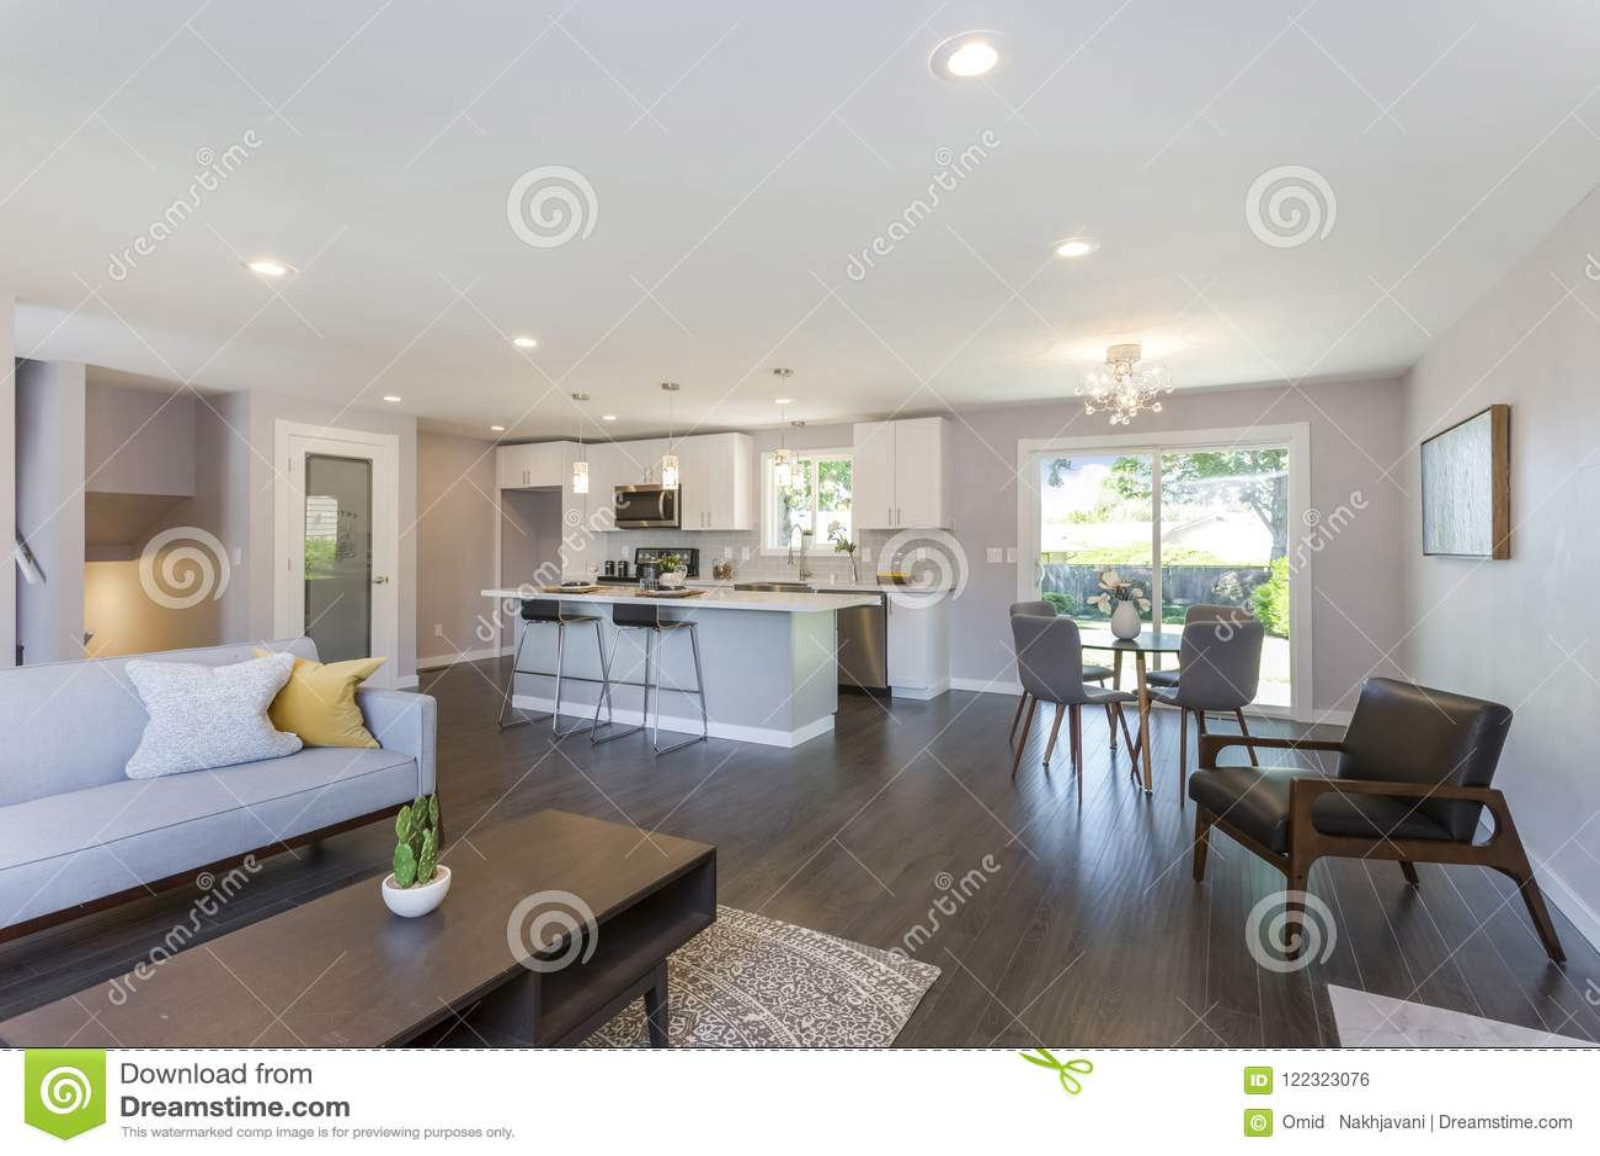 Modern Home Interior With Open Floor Plan. Stock Photo ...